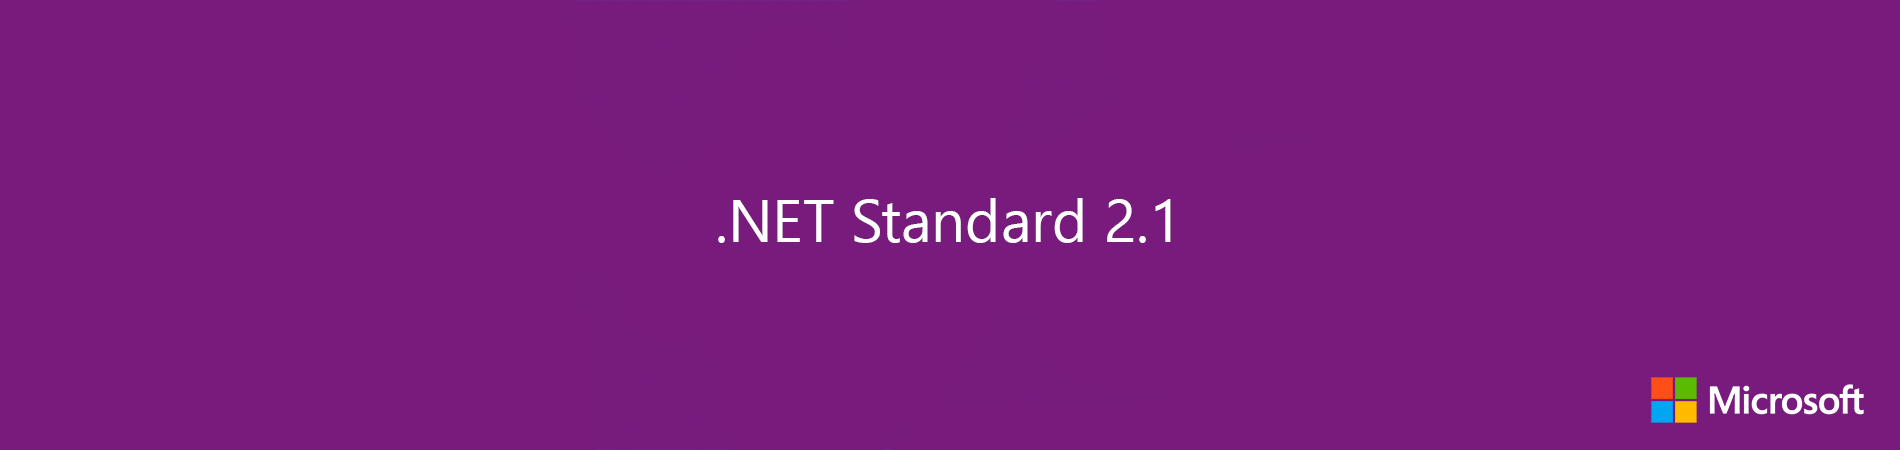 .NET Standard 2.1 - 1